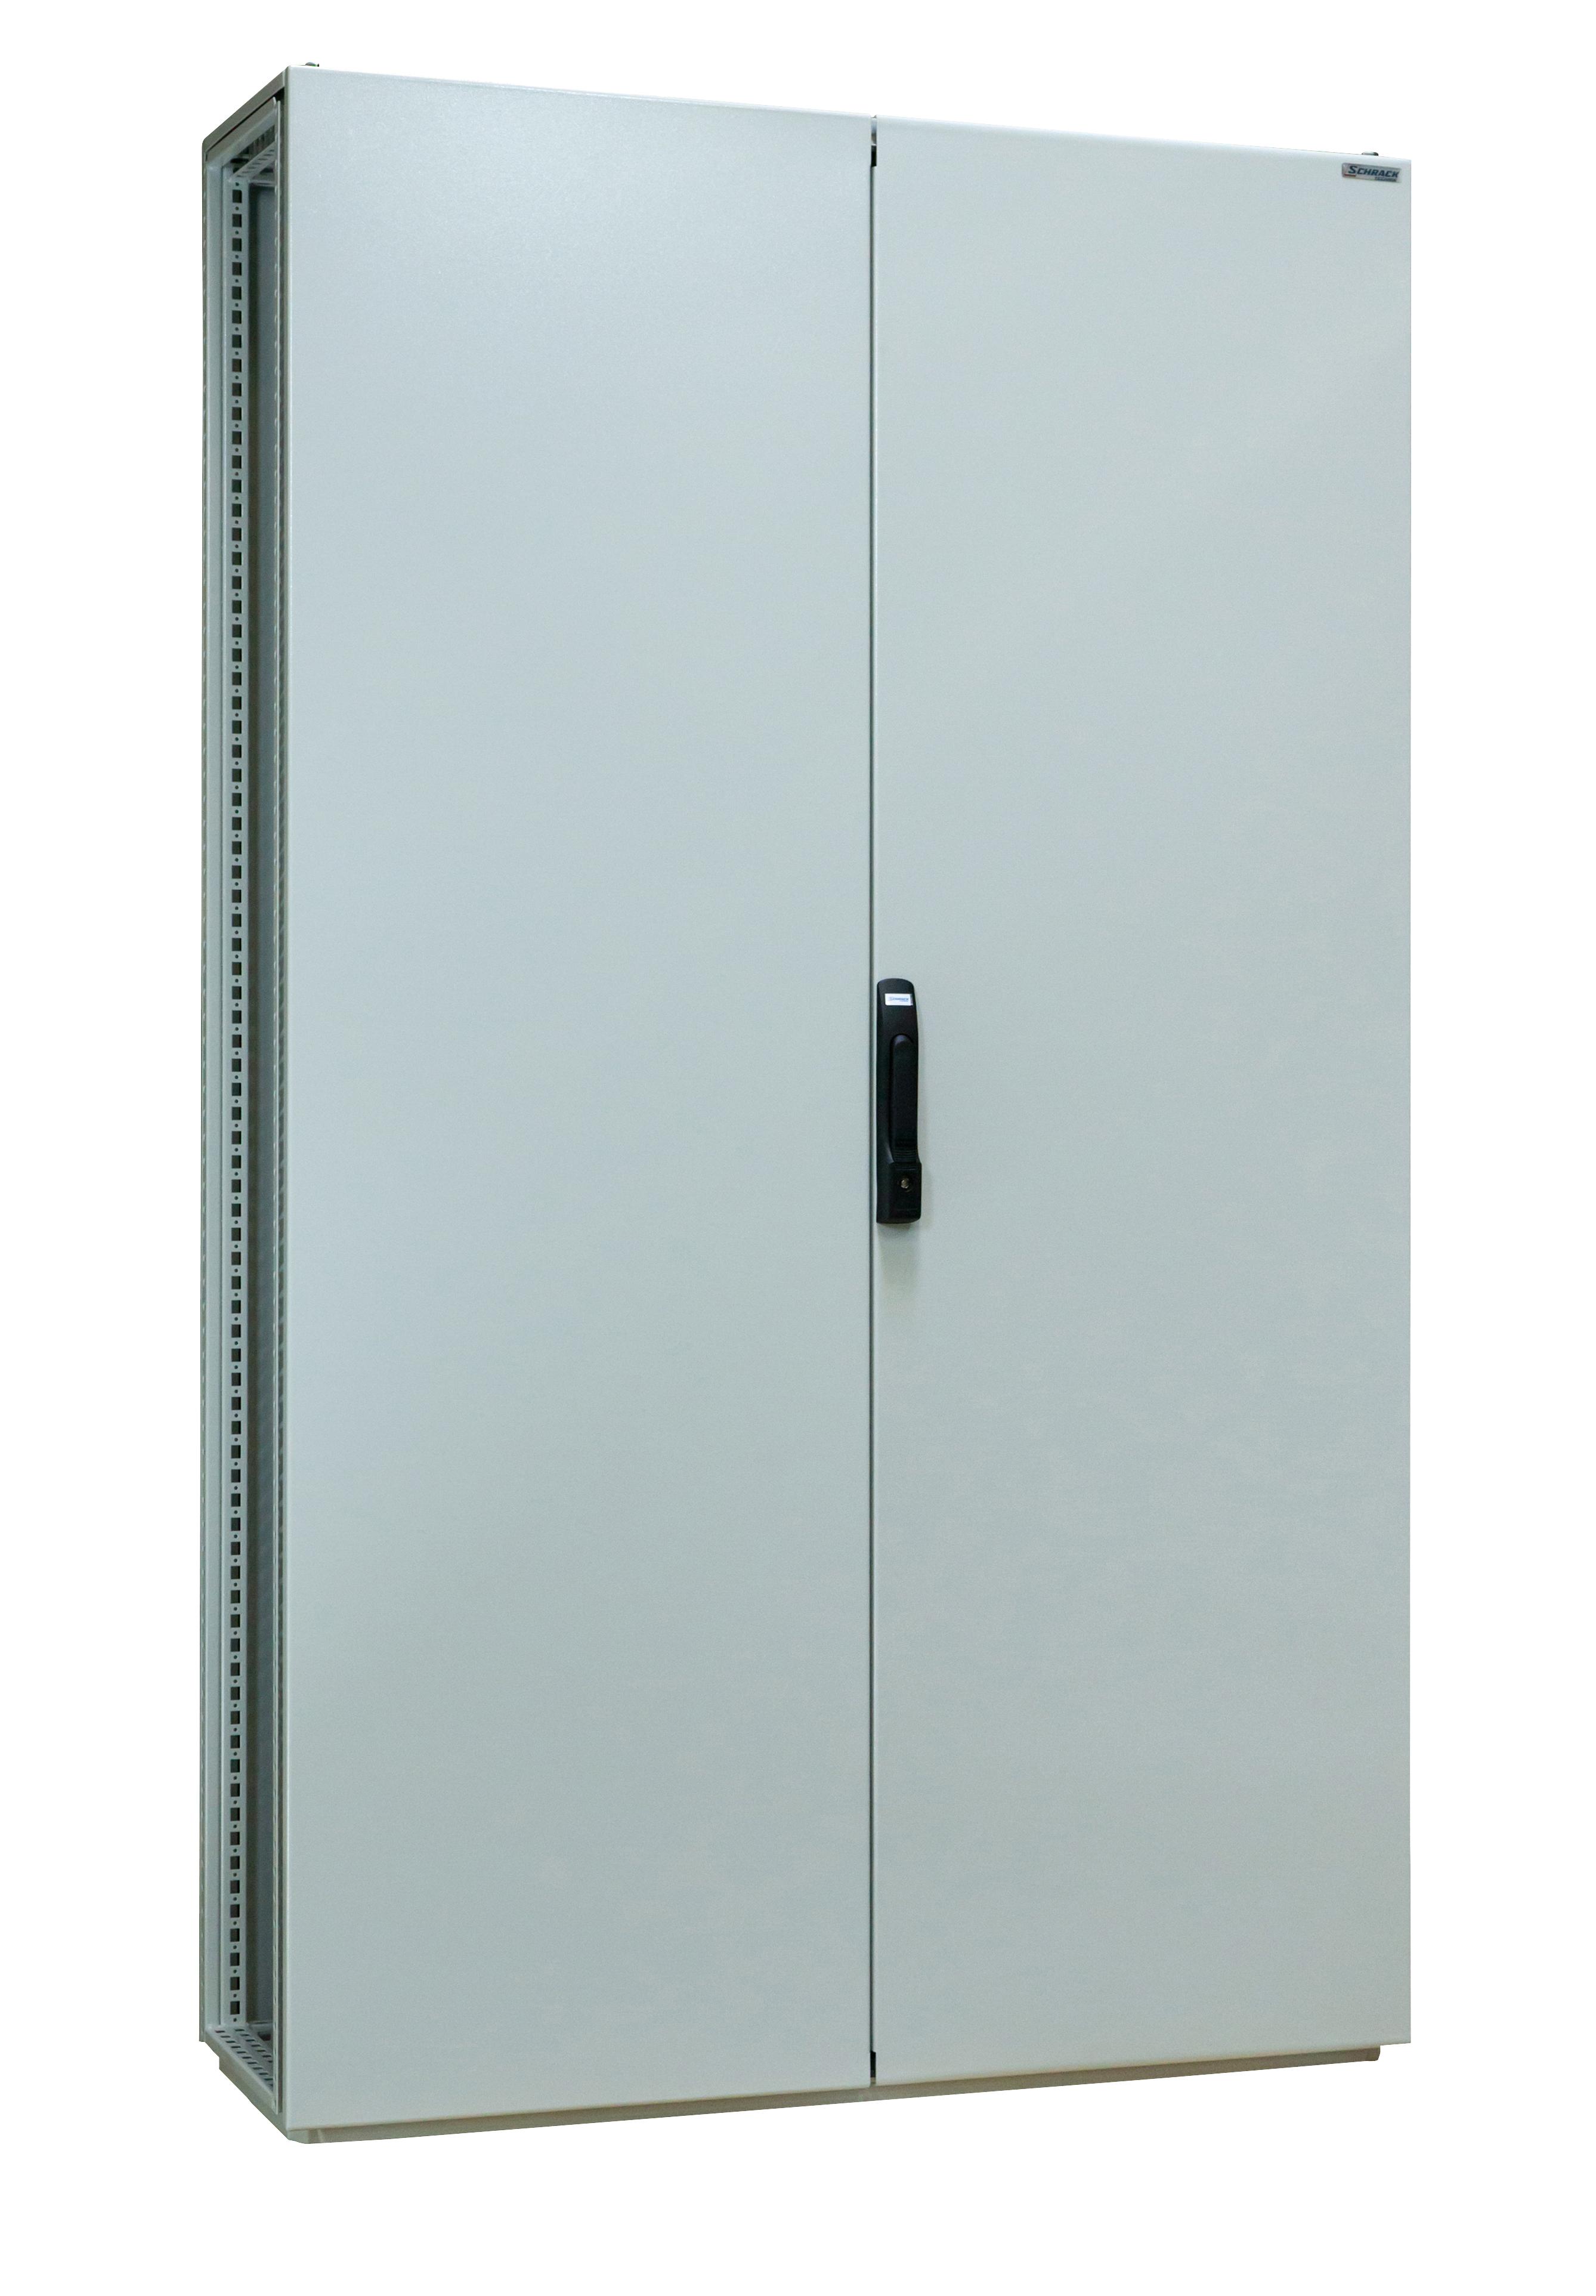 1 Stk Anreihschrank 2-türig, 1800x1000x500mm, RAL 7035 AS181052-5